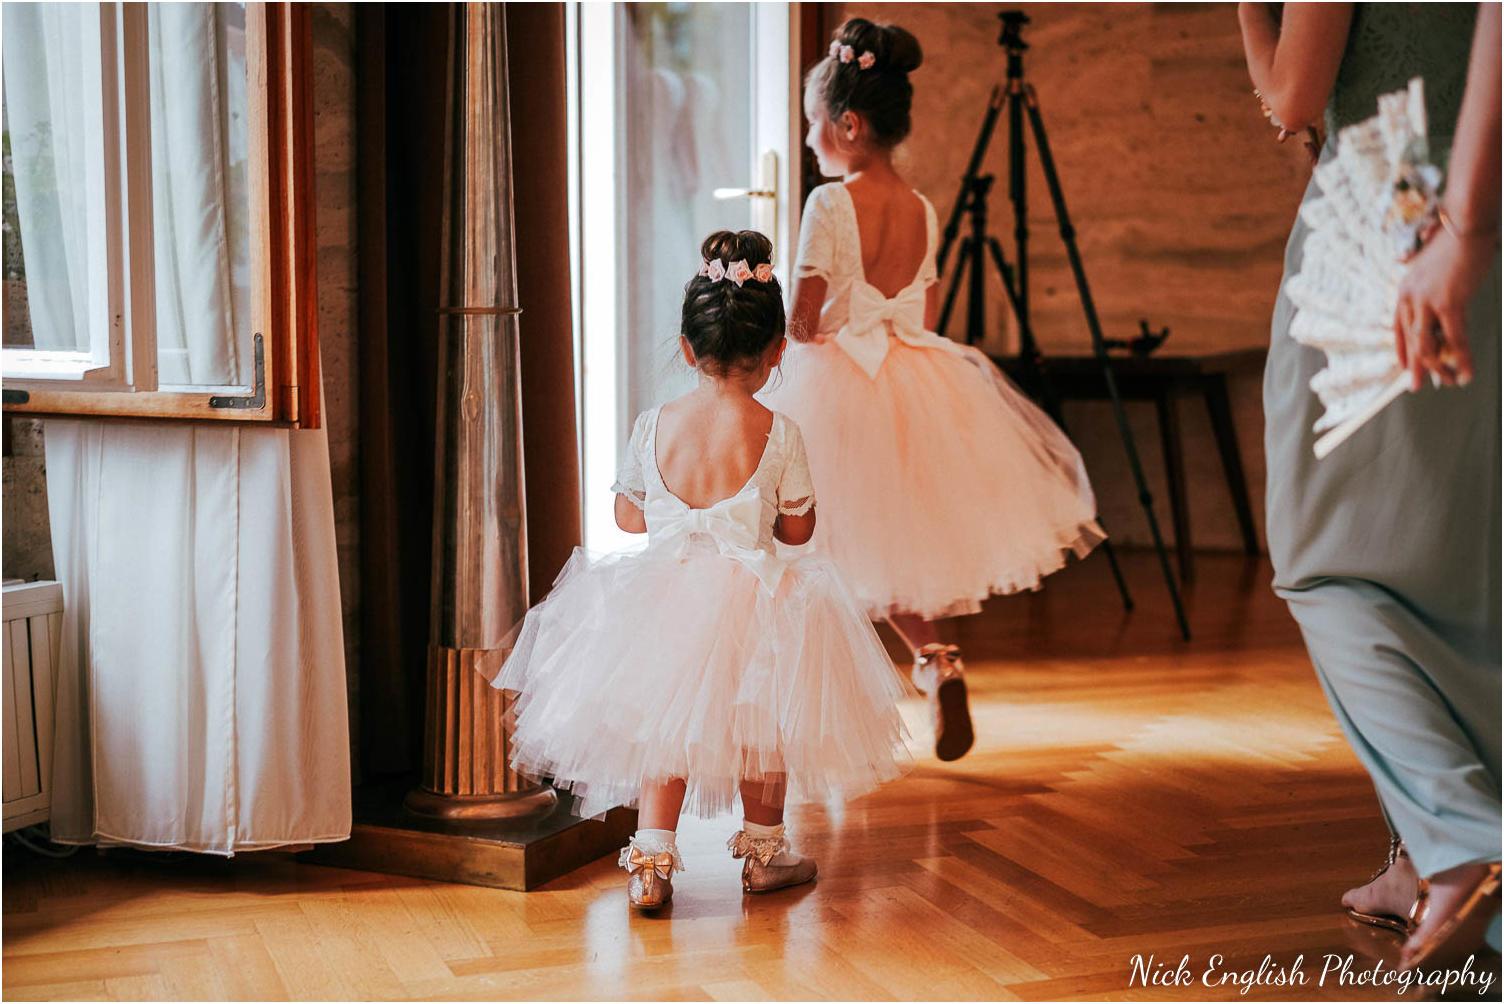 Destination_Wedding_Photographer_Slovenia_Nick_English_Photography-47.jpg